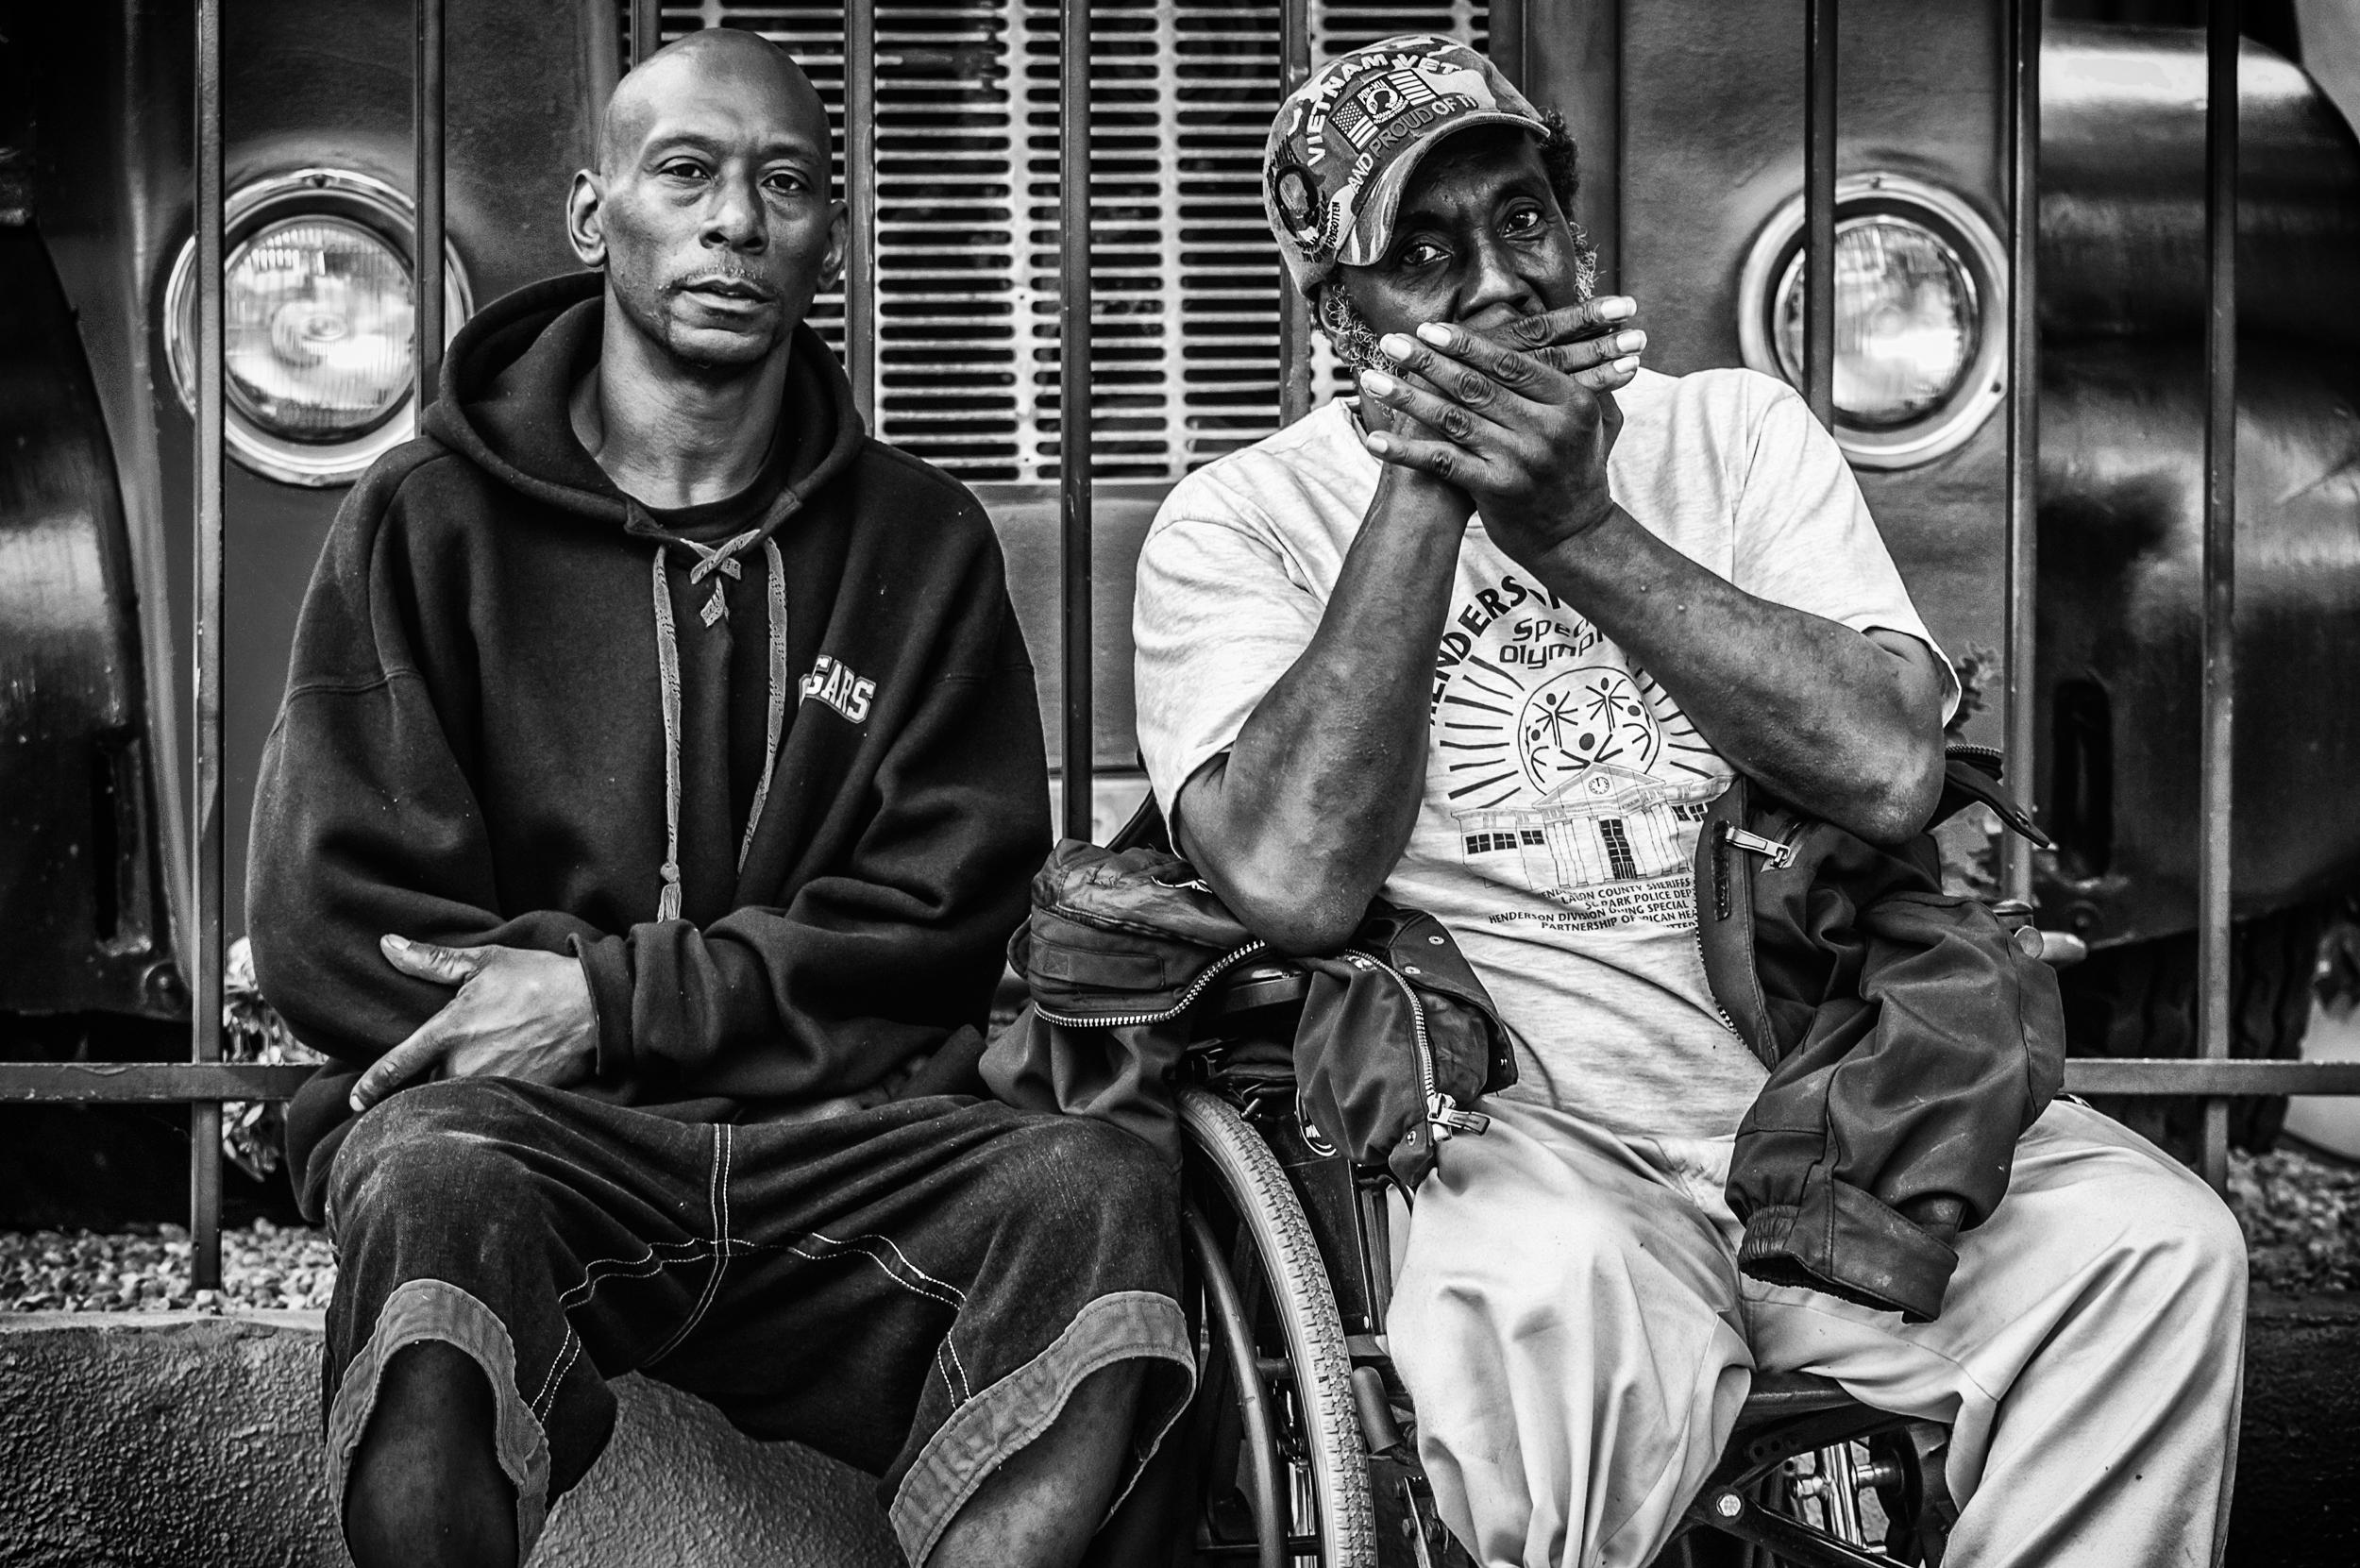 street vets, 2013.